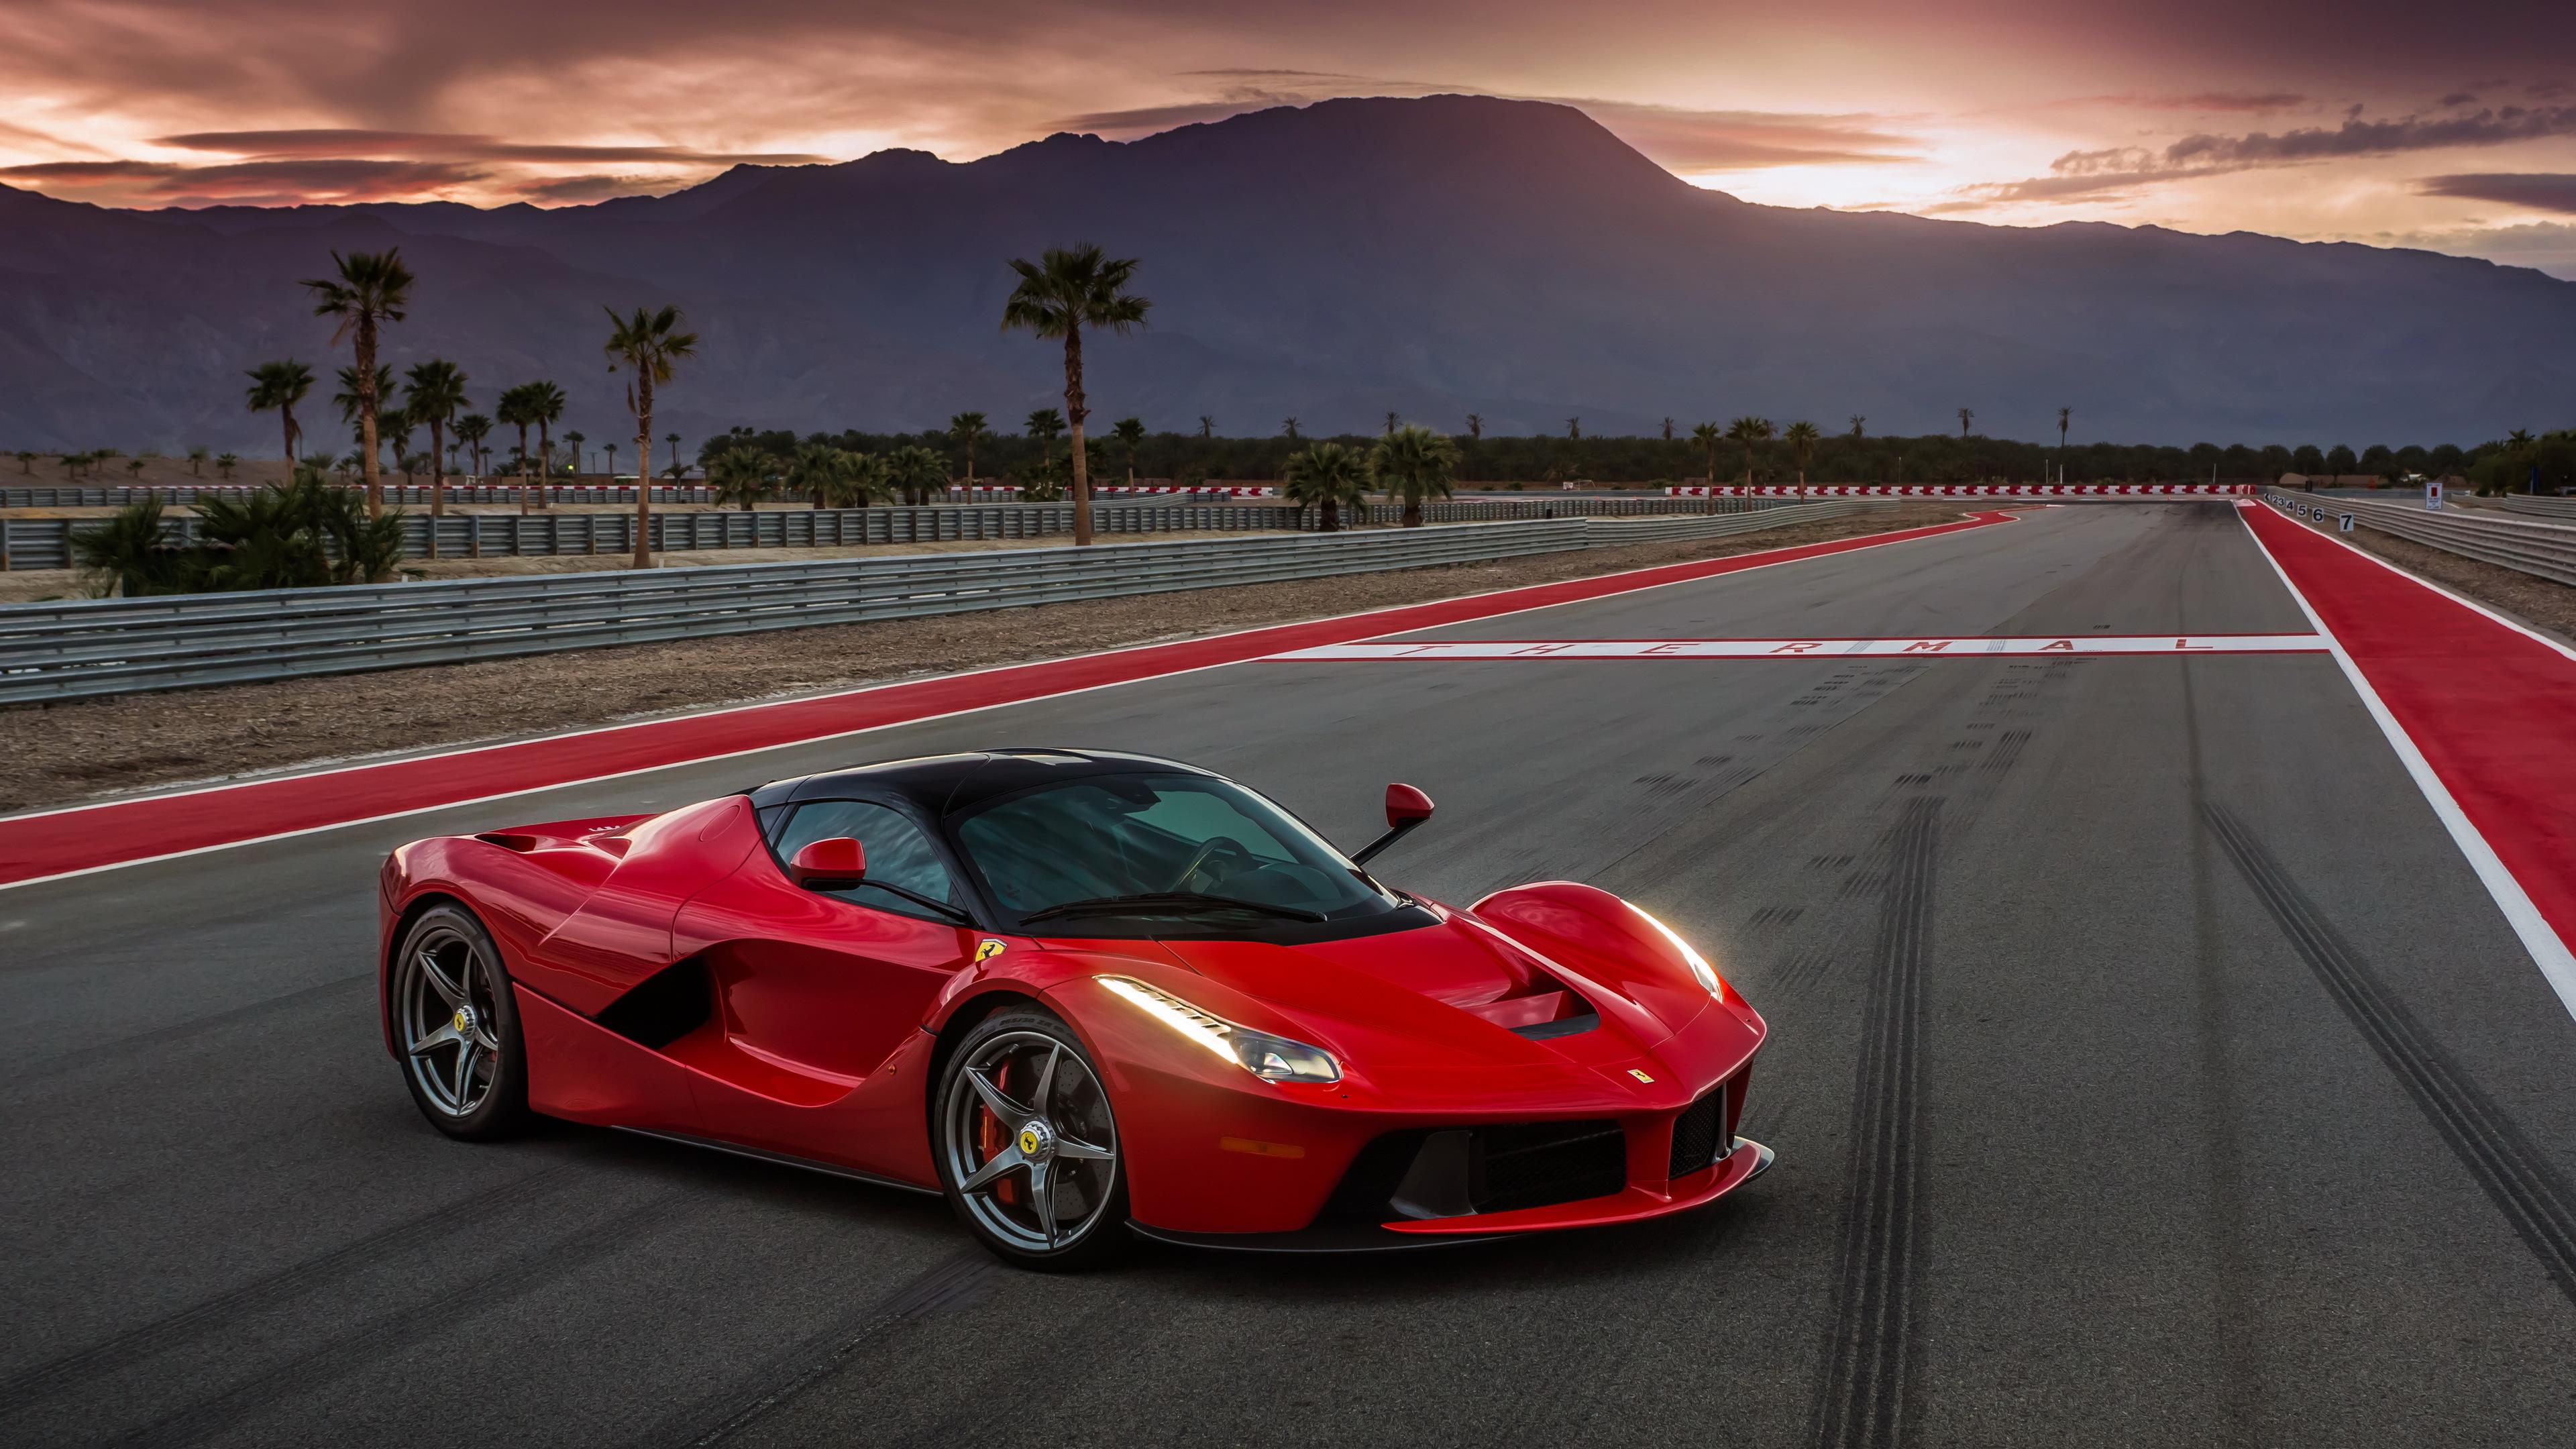 ferrari laferrari 1539104771 - Ferrari LaFerrari - red wallpapers, ferrari wallpapers, cars wallpapers